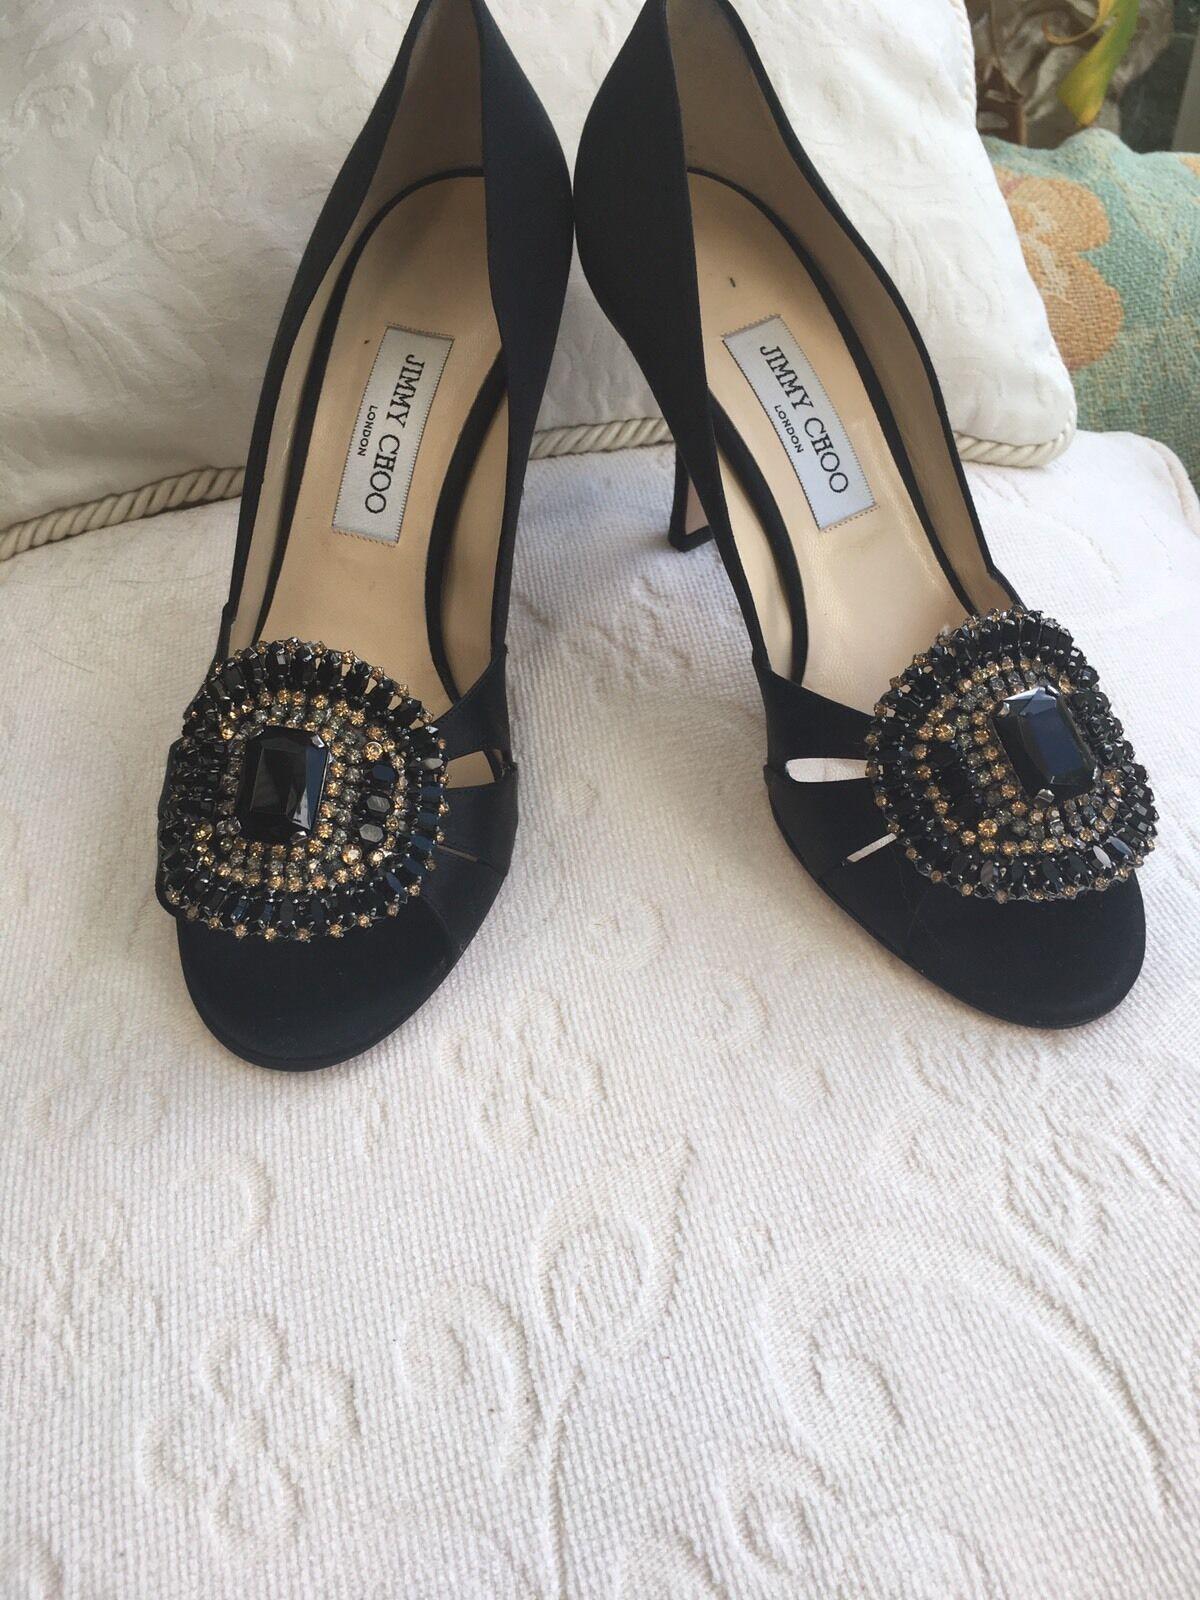 JIMMY CHOO Noir Noir Noir Satin Bout Ouvert Bijou Embelli Chaussures Taille 7 E40 99dcf2